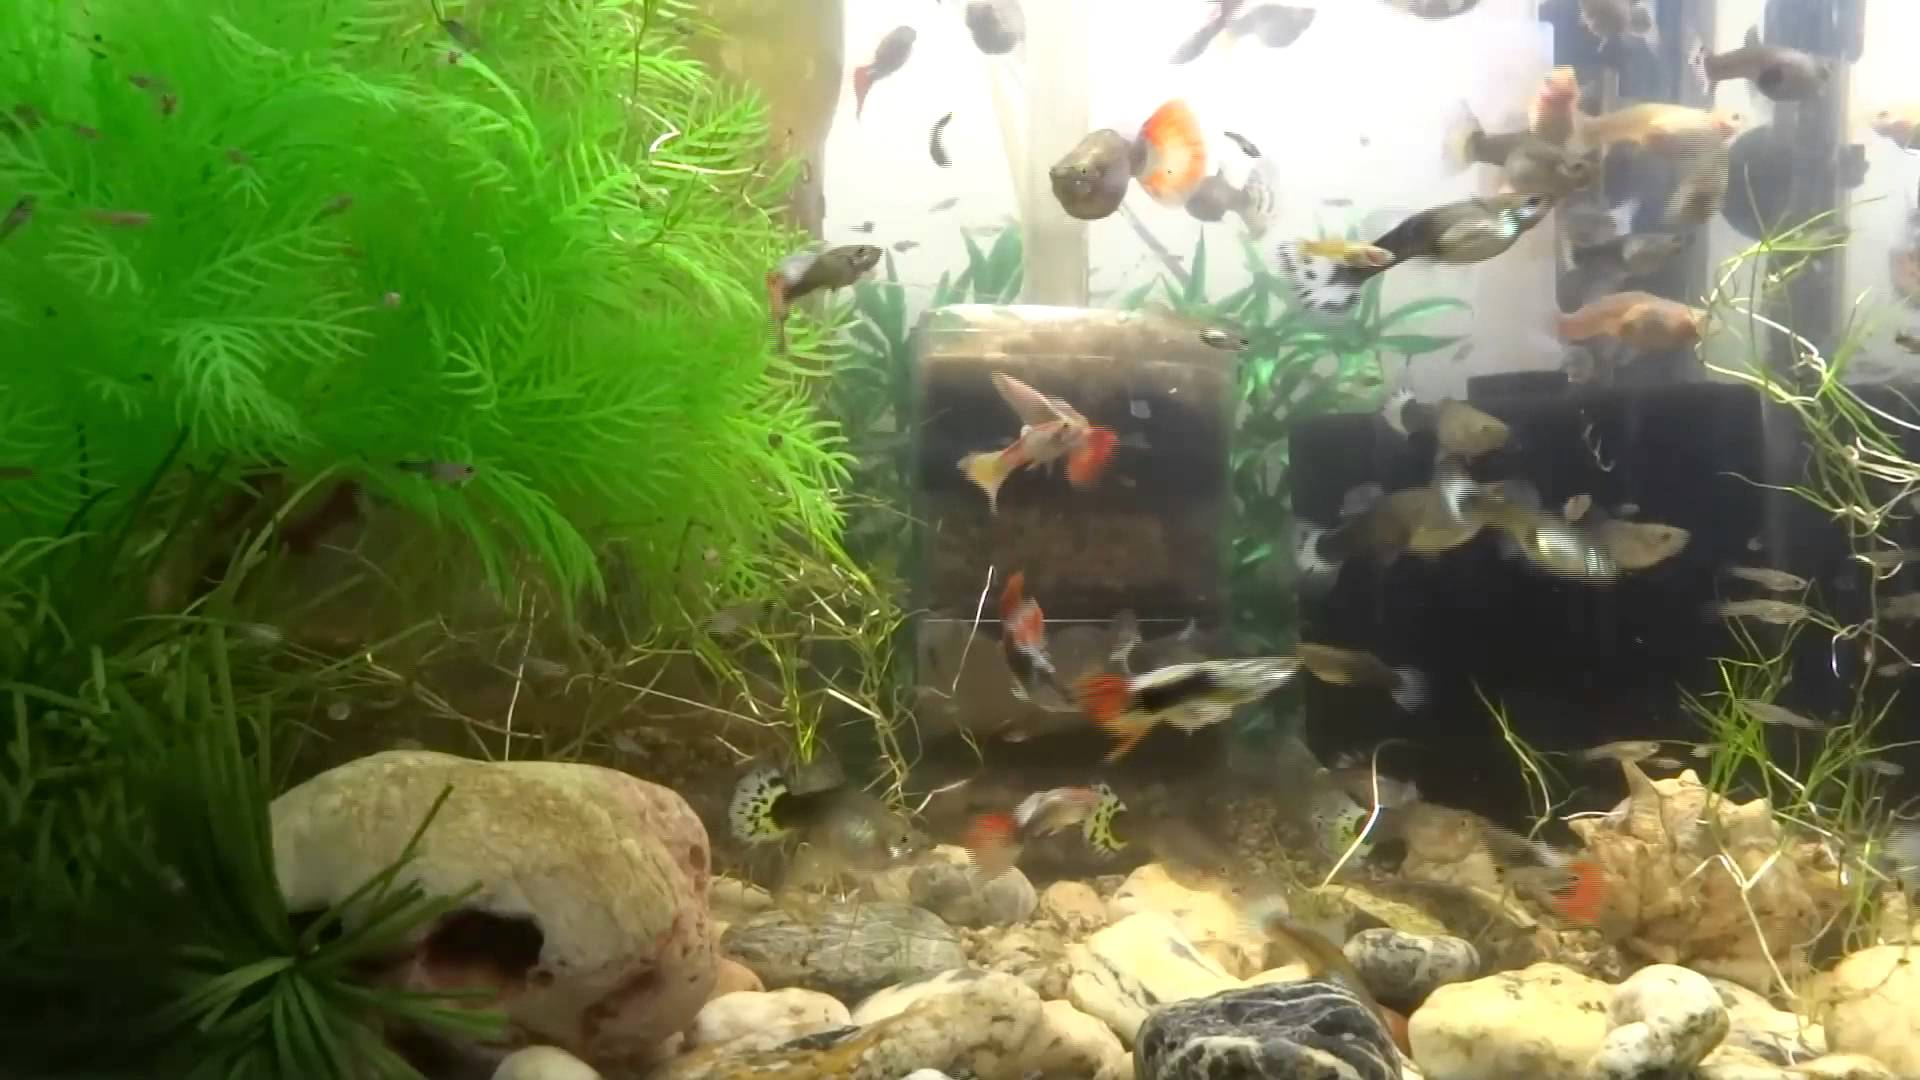 Beautiful-Fish-Aquarium-fishtank-fish-tank-howto-make-design-aquarium-FHD-1080P-NEW-wallpaper-wpc5802646